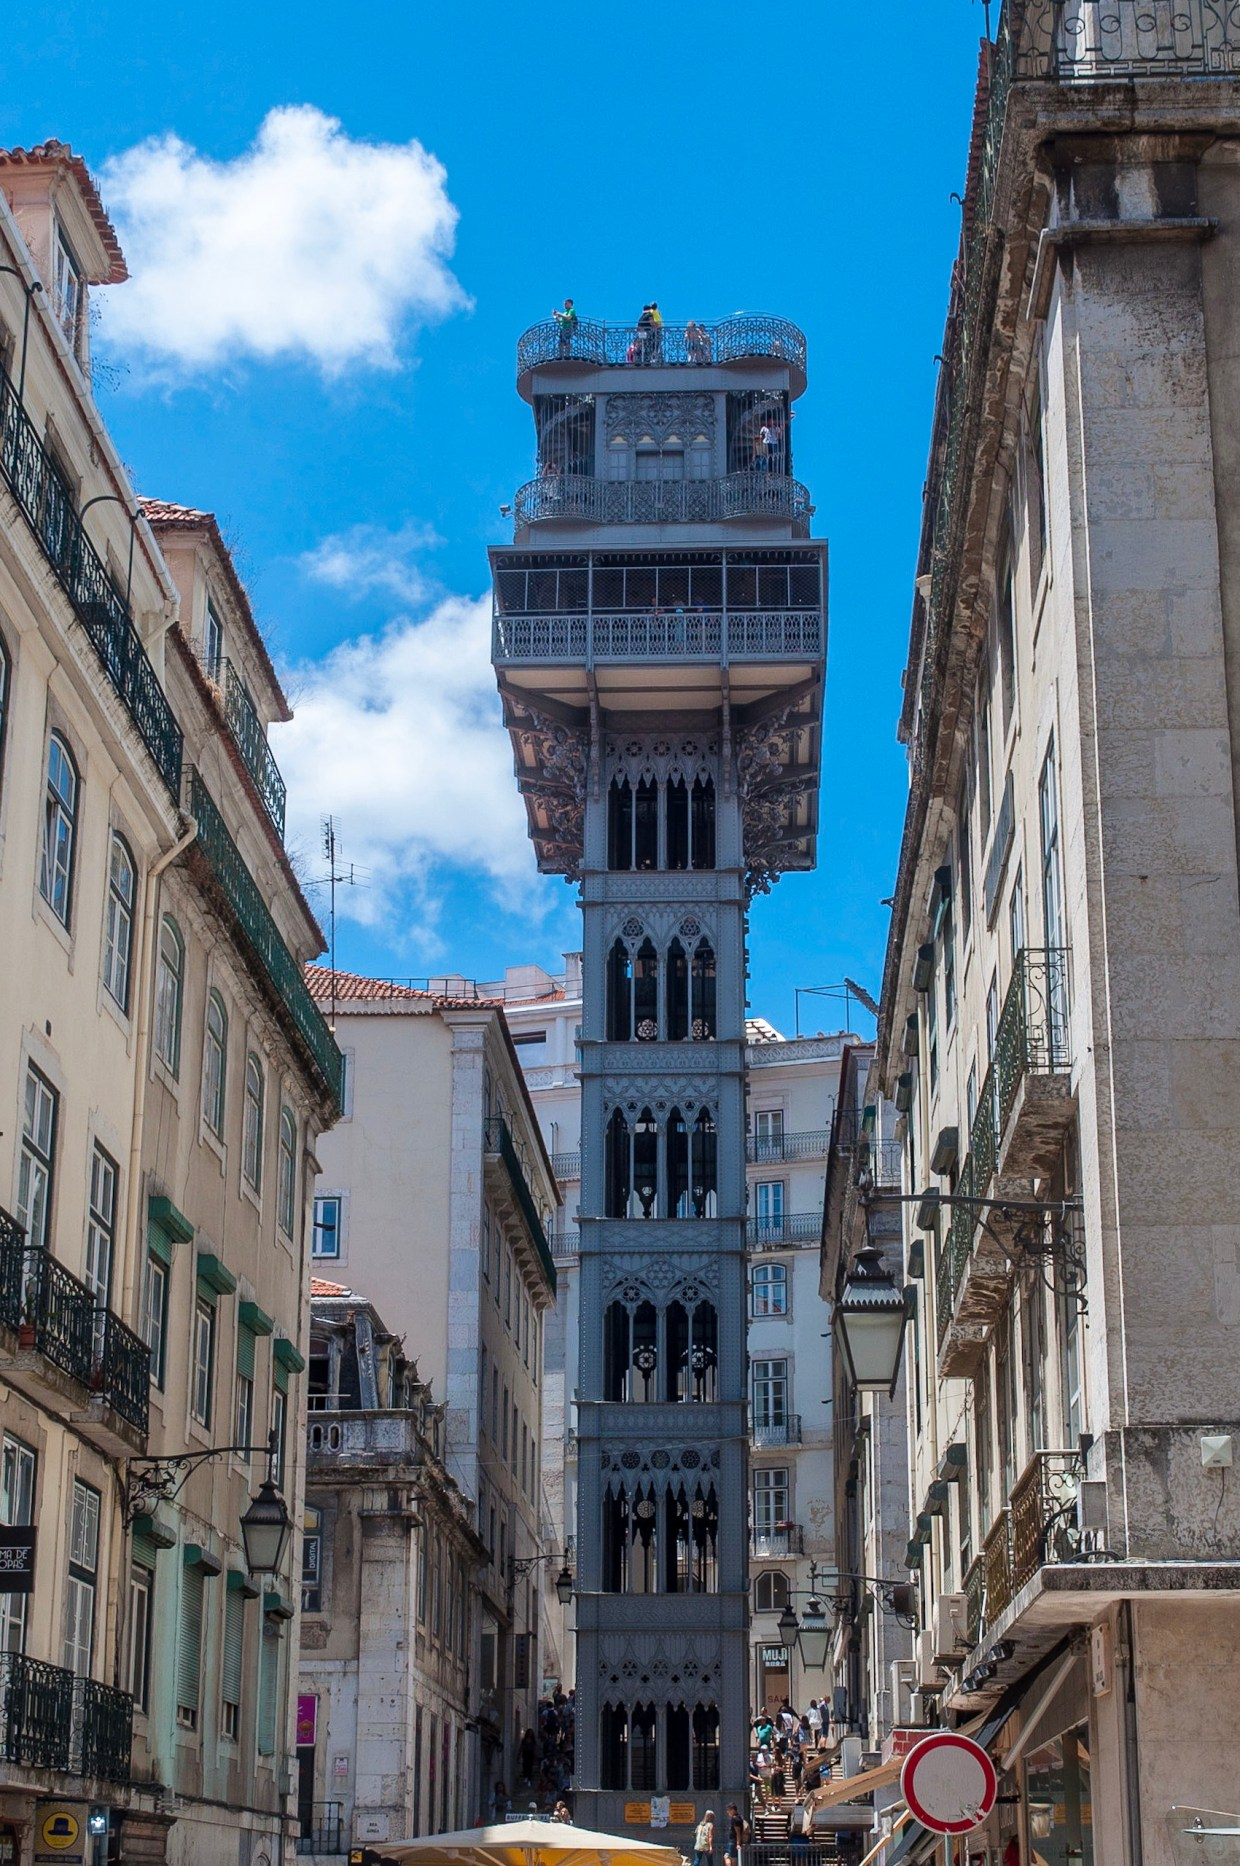 Elevador de Santa Justa, Lissabon, Juli 2017